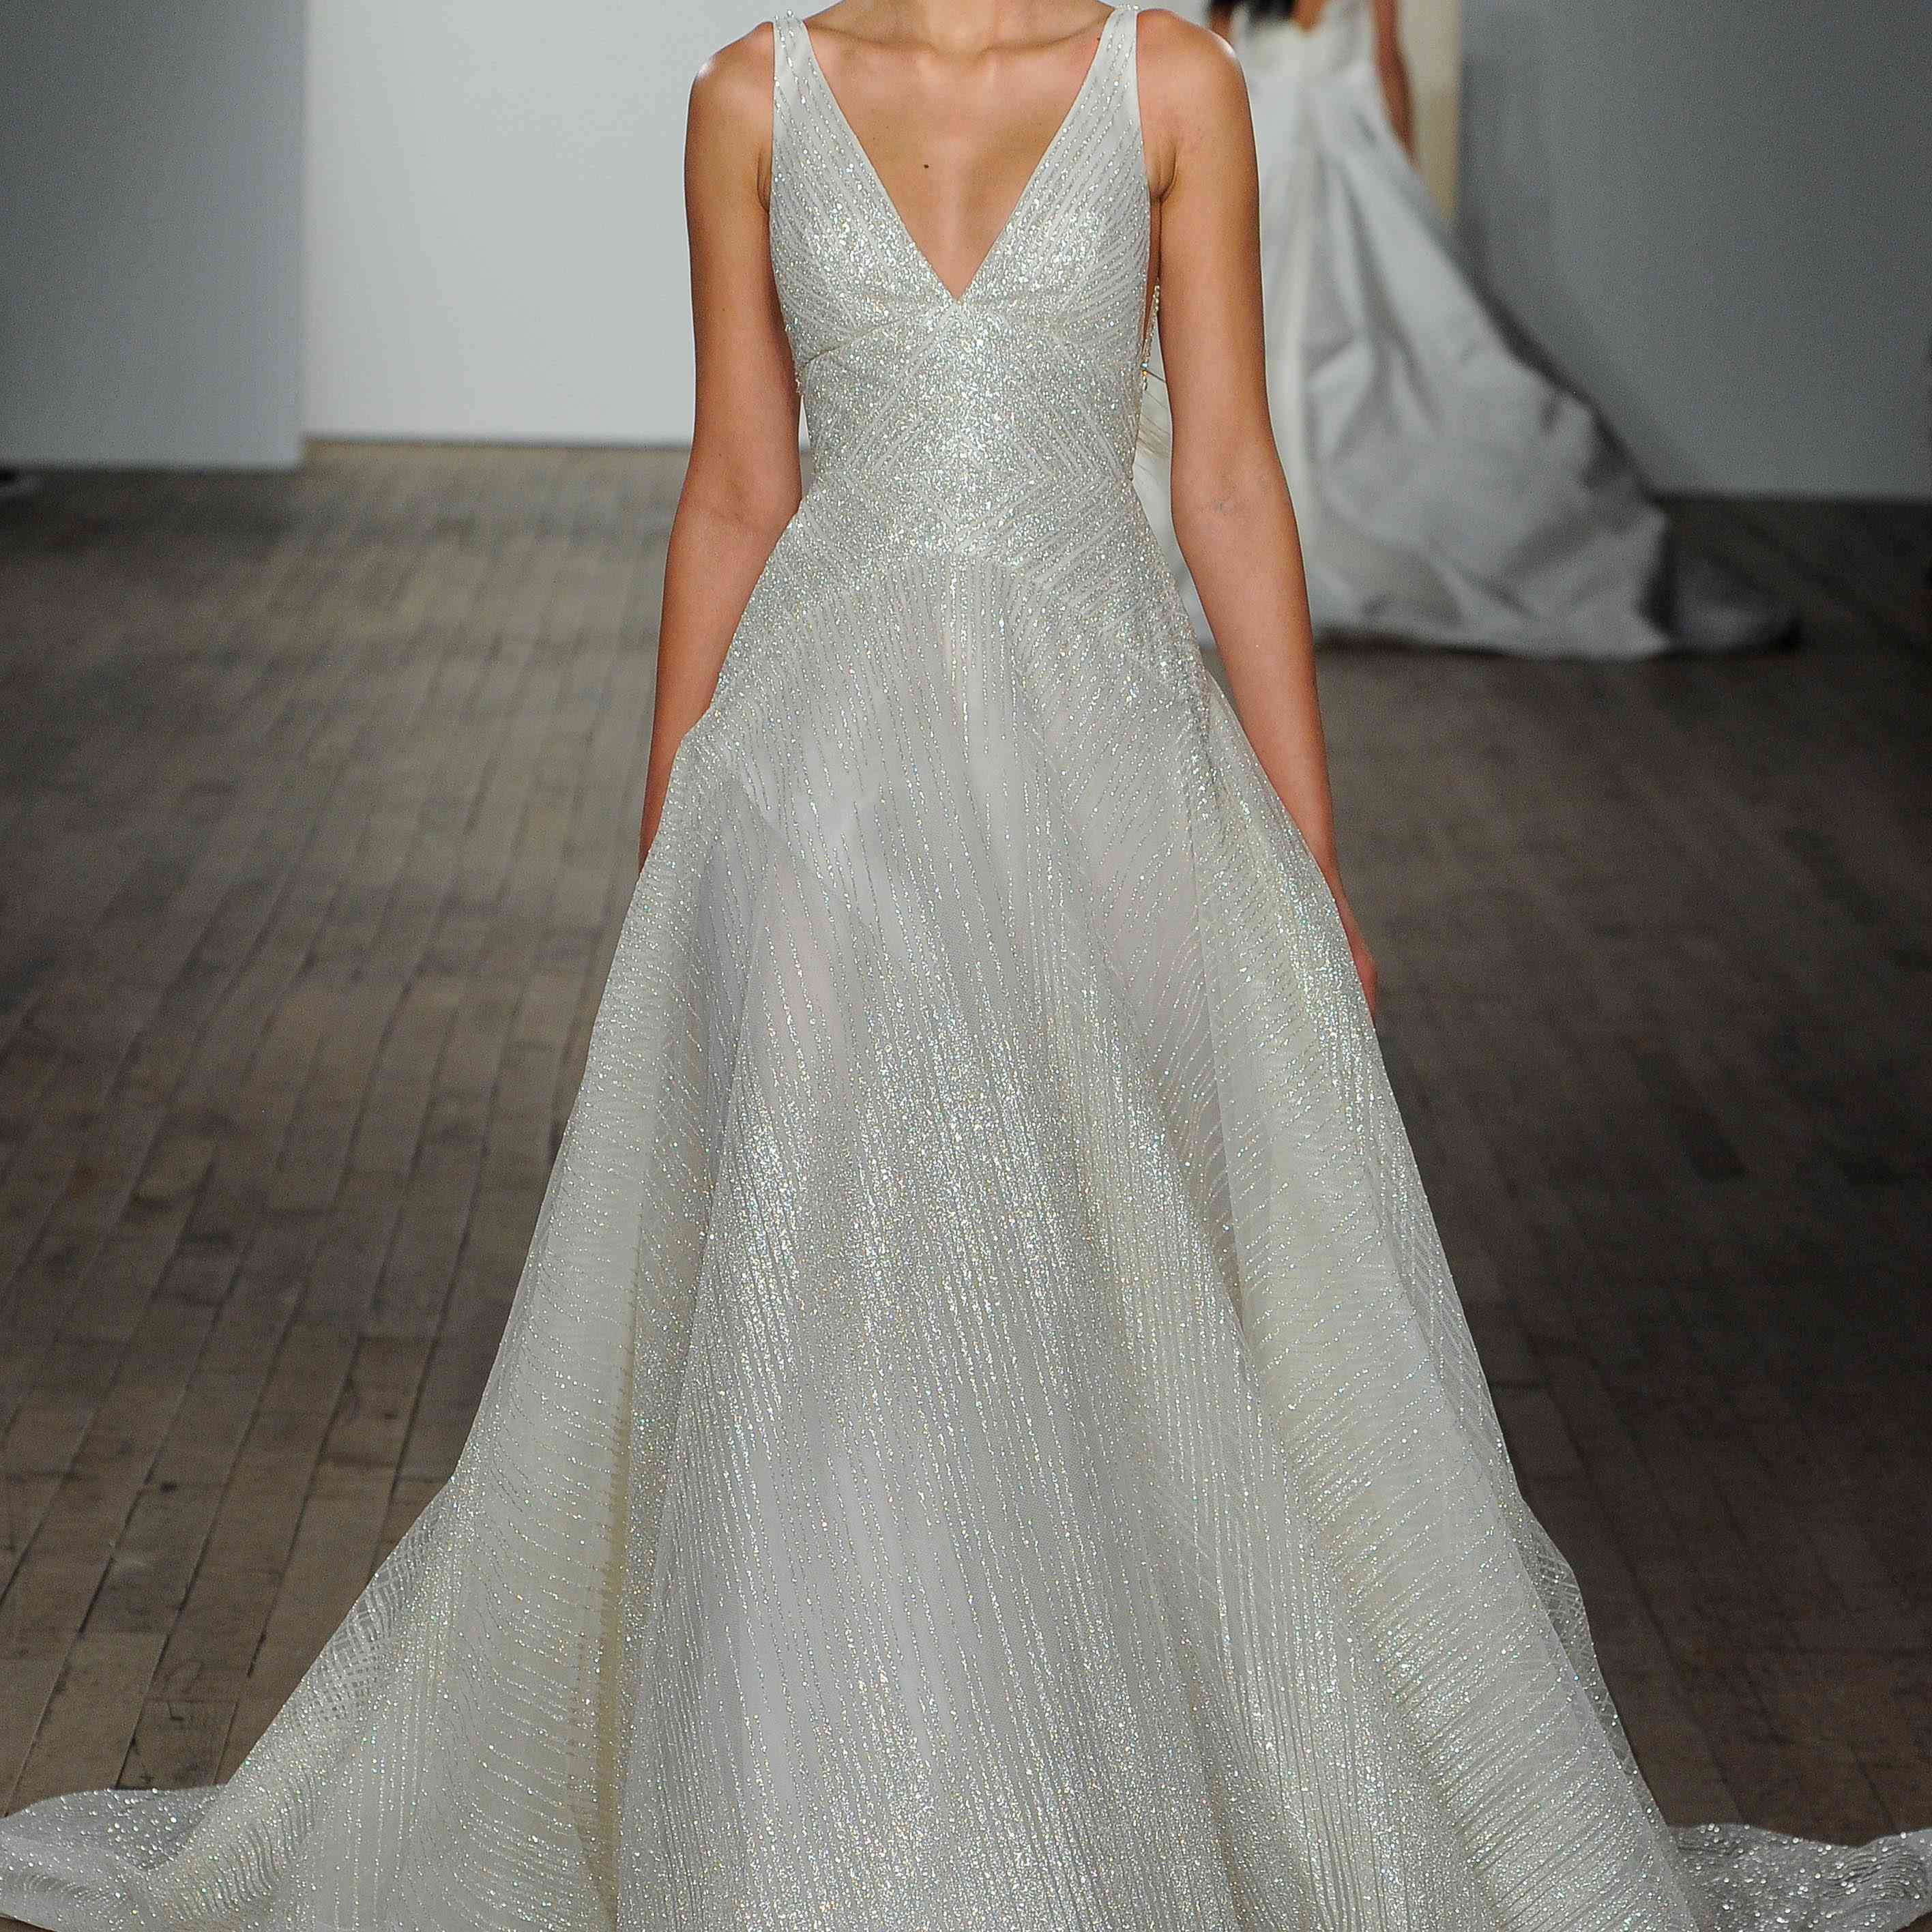 Celeste plunging wedding dress by lazaro